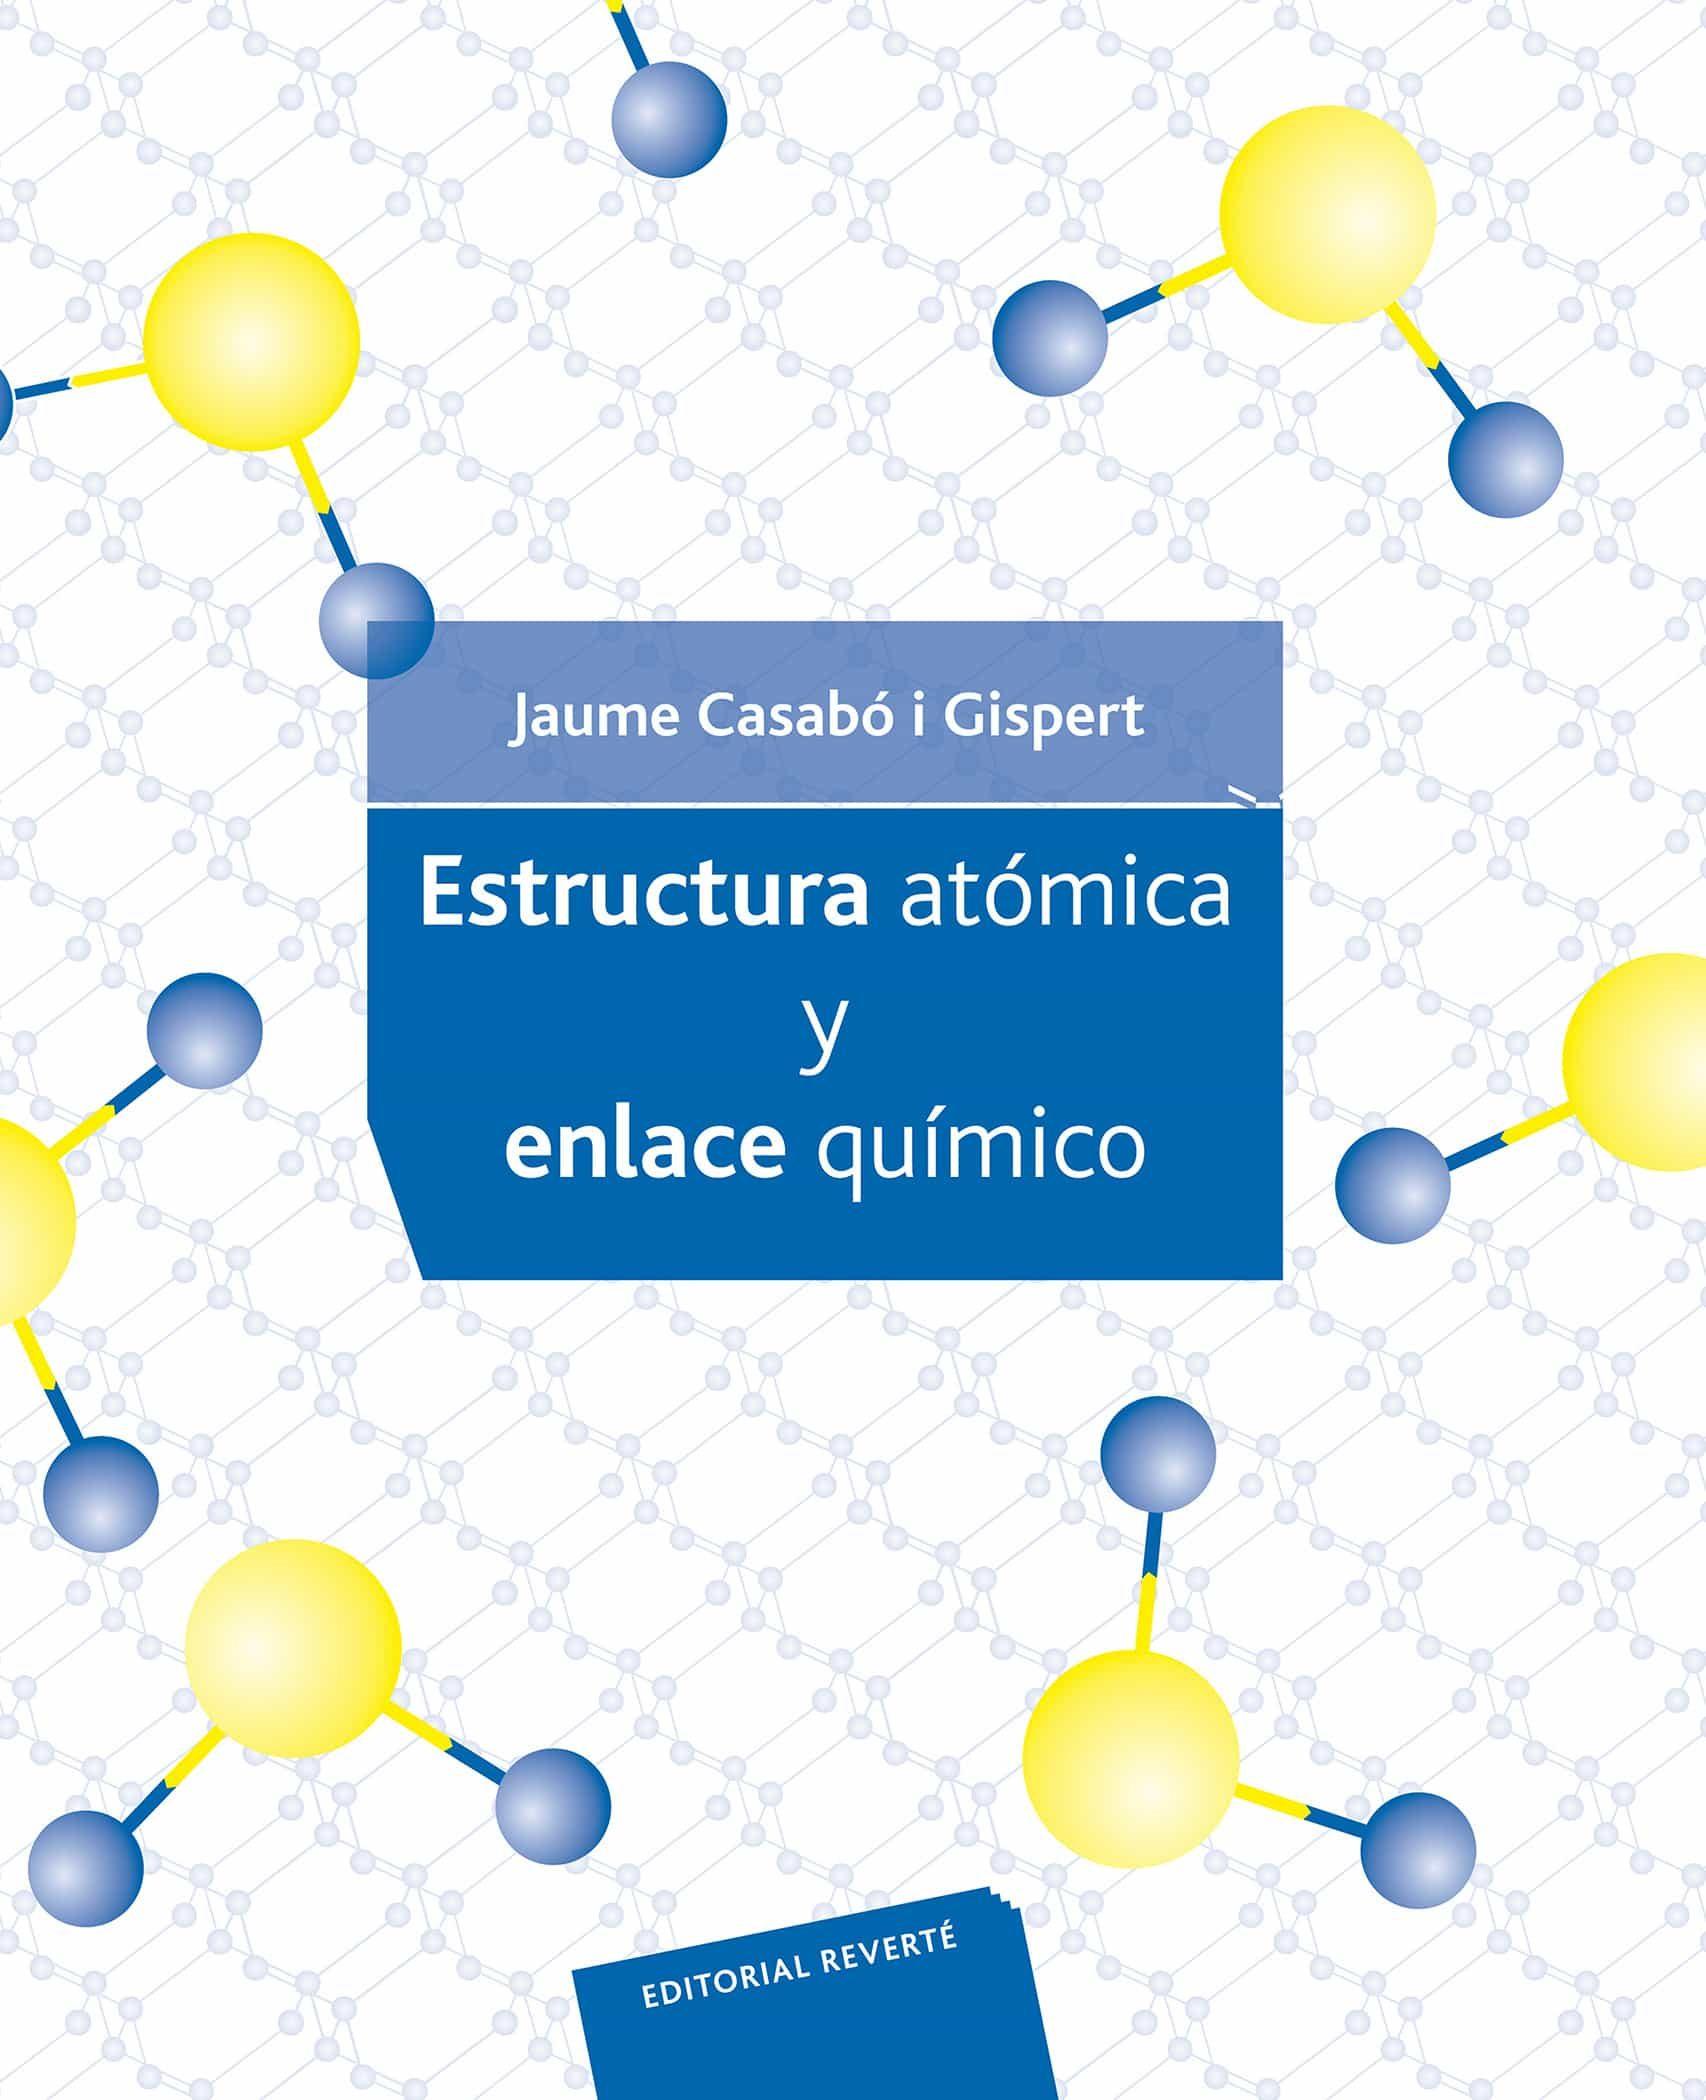 Estructura Atomica Y Enlace Quimico por Jaume Casabo I Gispert